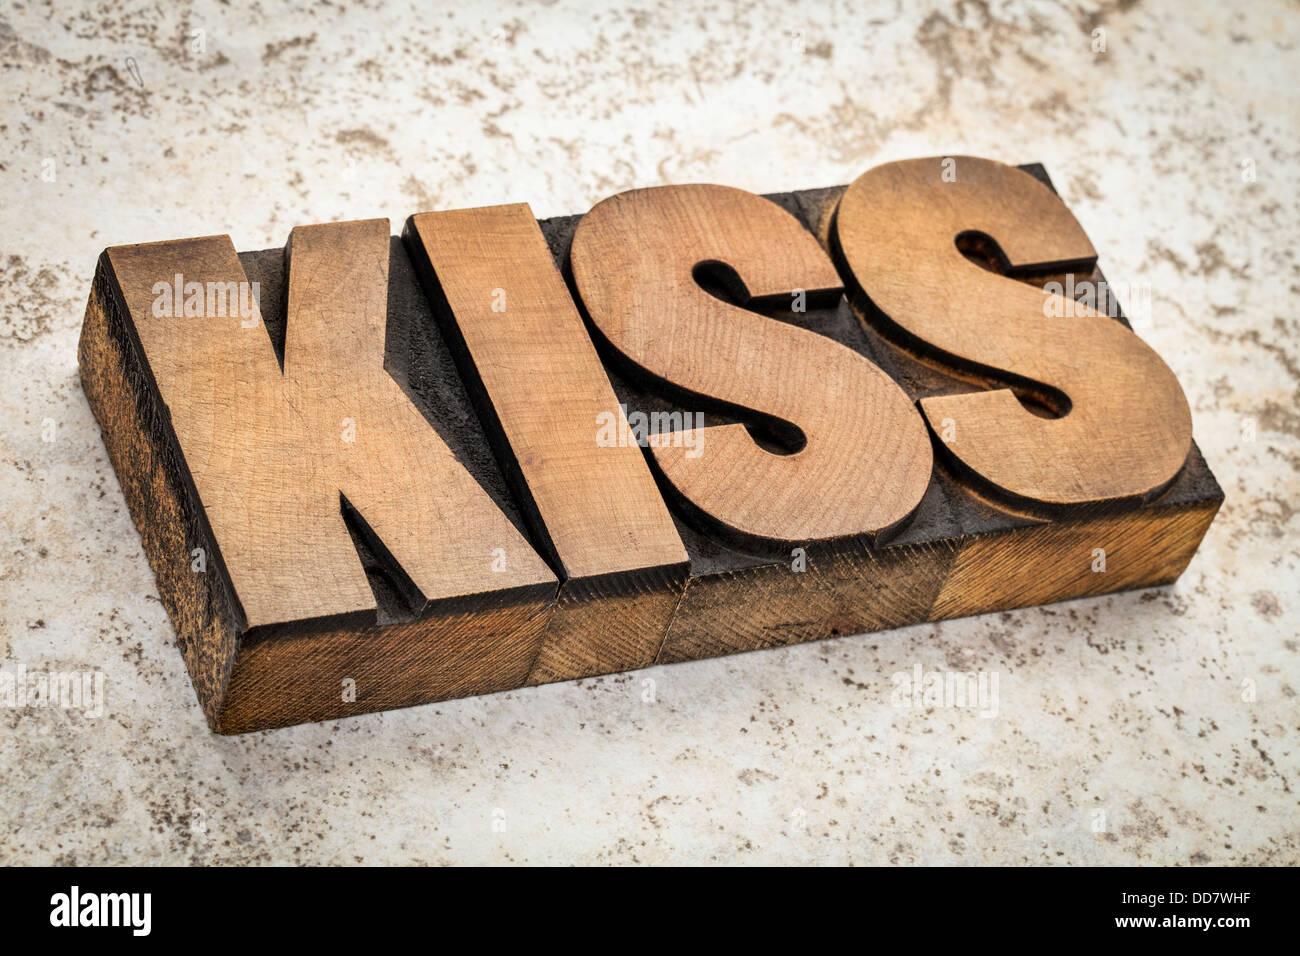 kiss word or acronym (keep it simple stupid) in letterpress wood type against ceramic tile - Stock Image